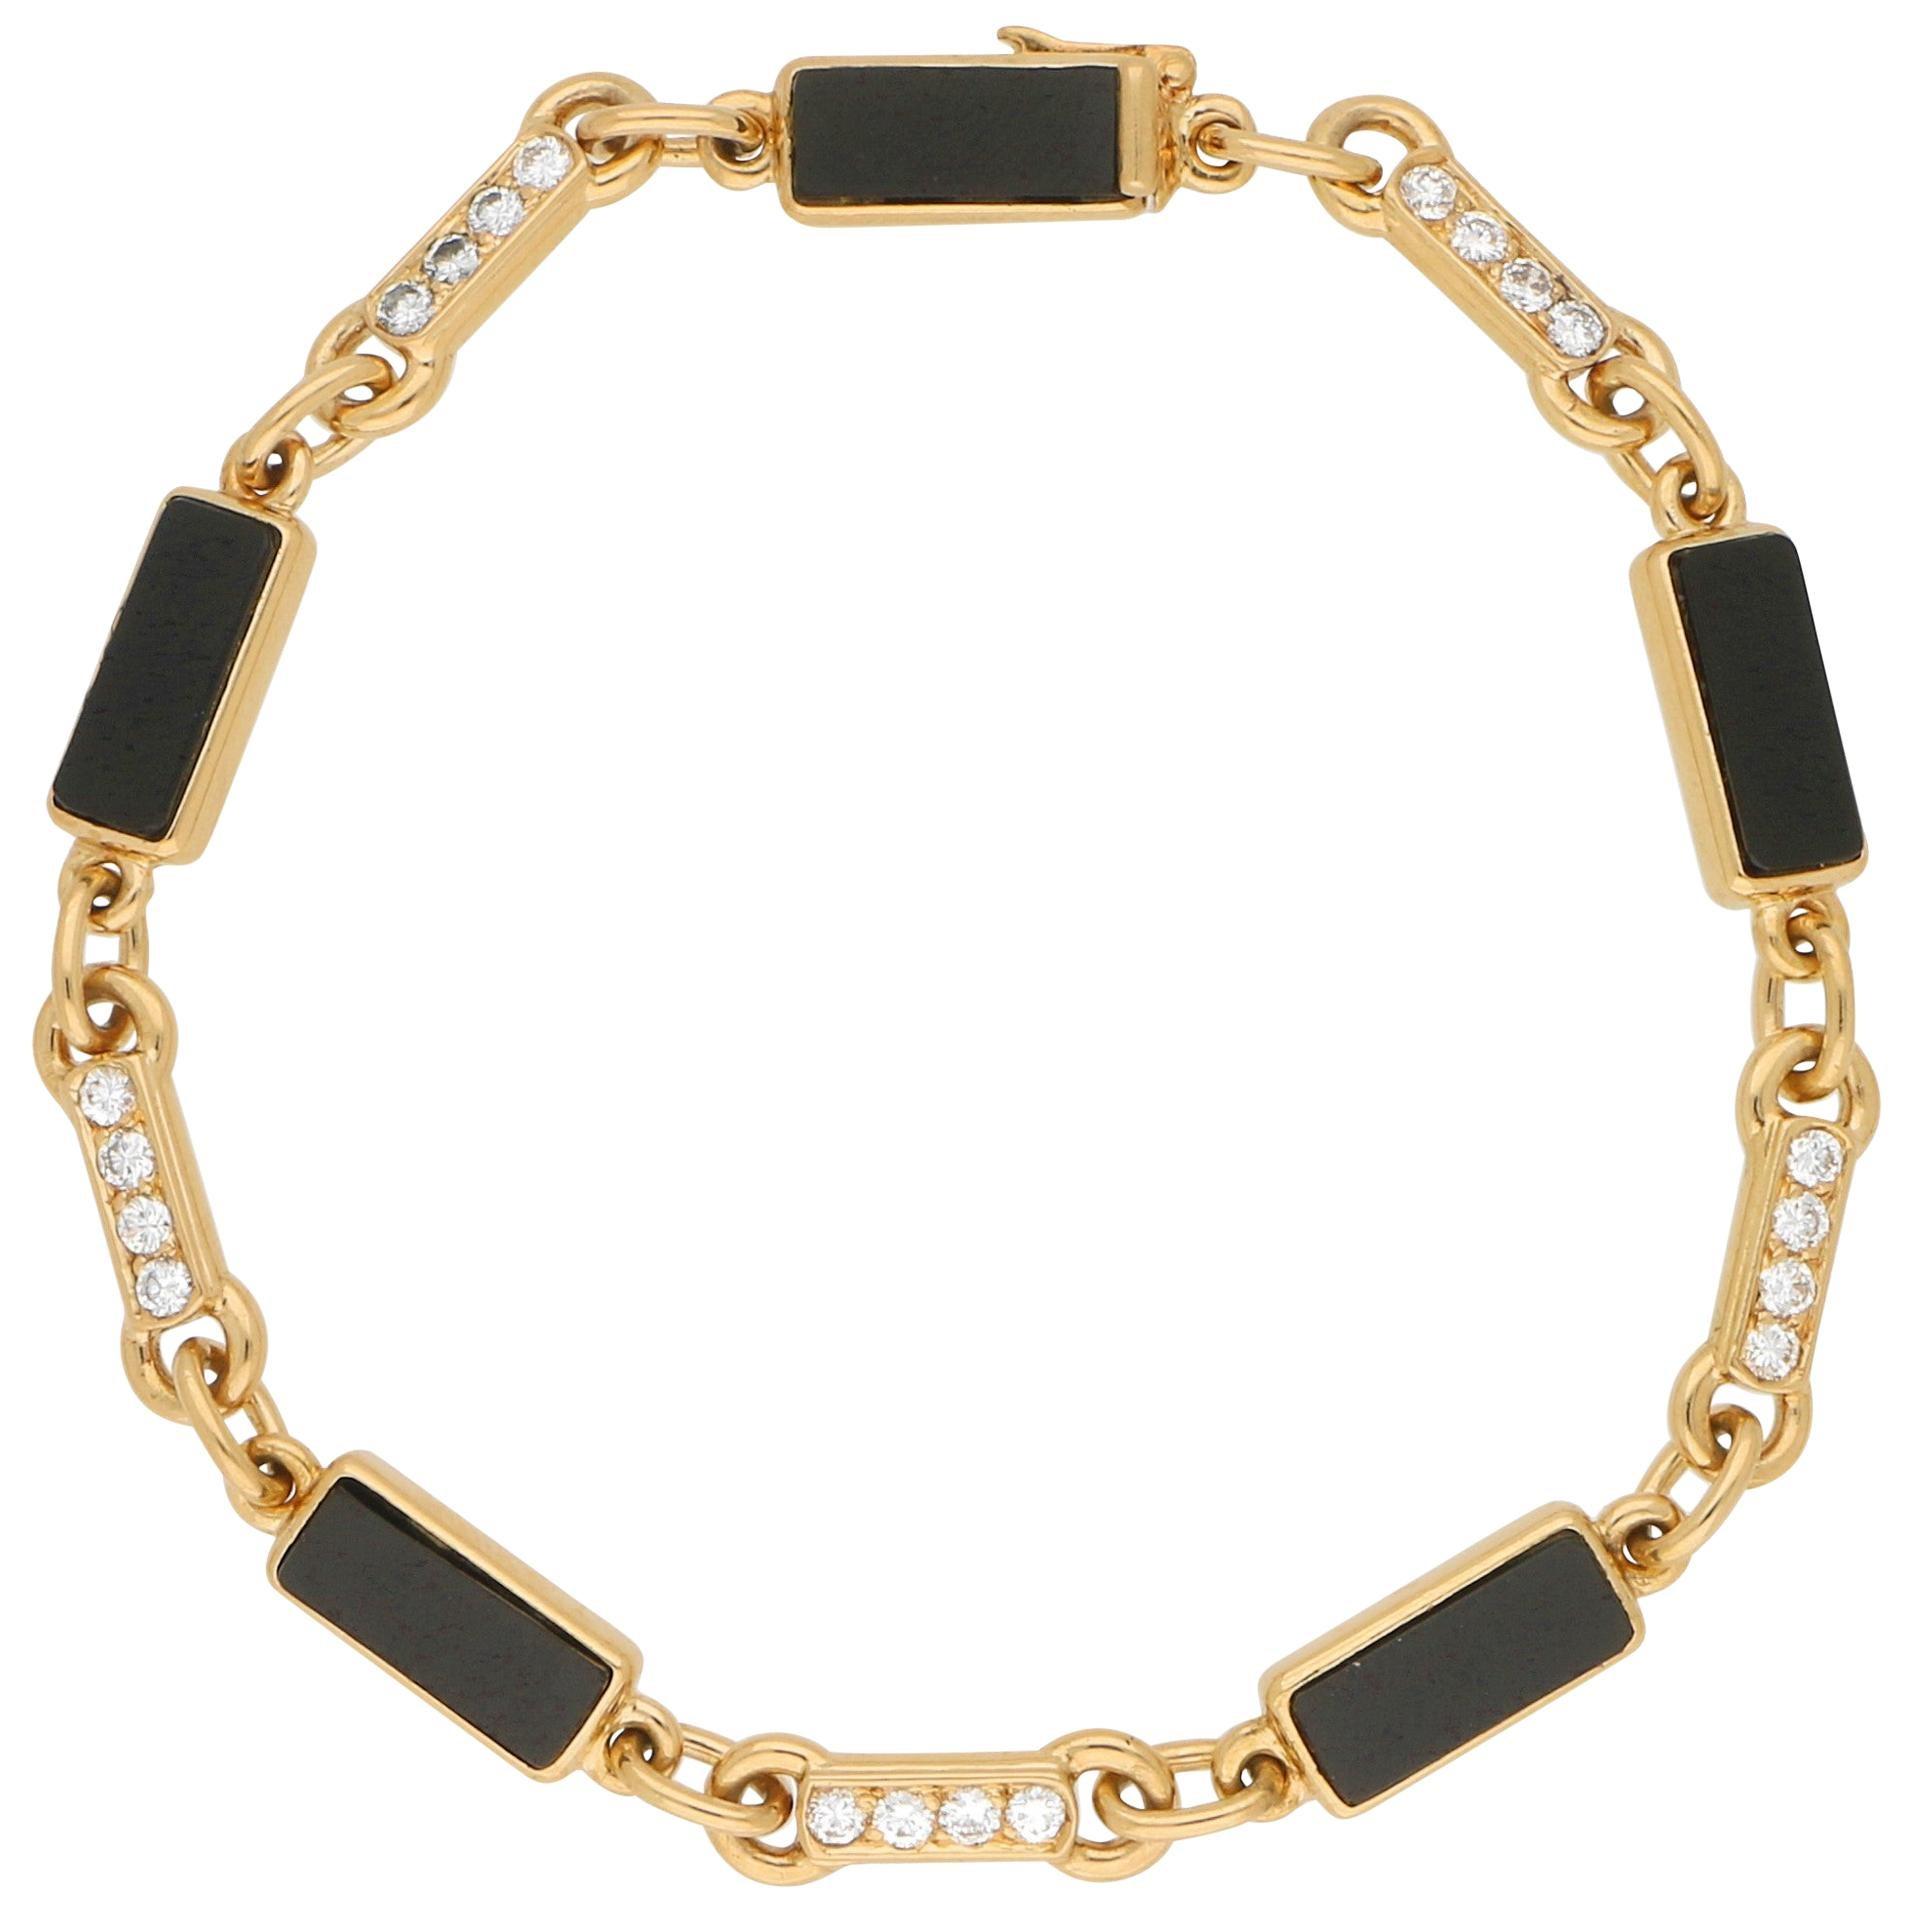 Van Cleef & Arpels Onyx and Diamond Chain Bracelet in 18 Karat Yellow Gold